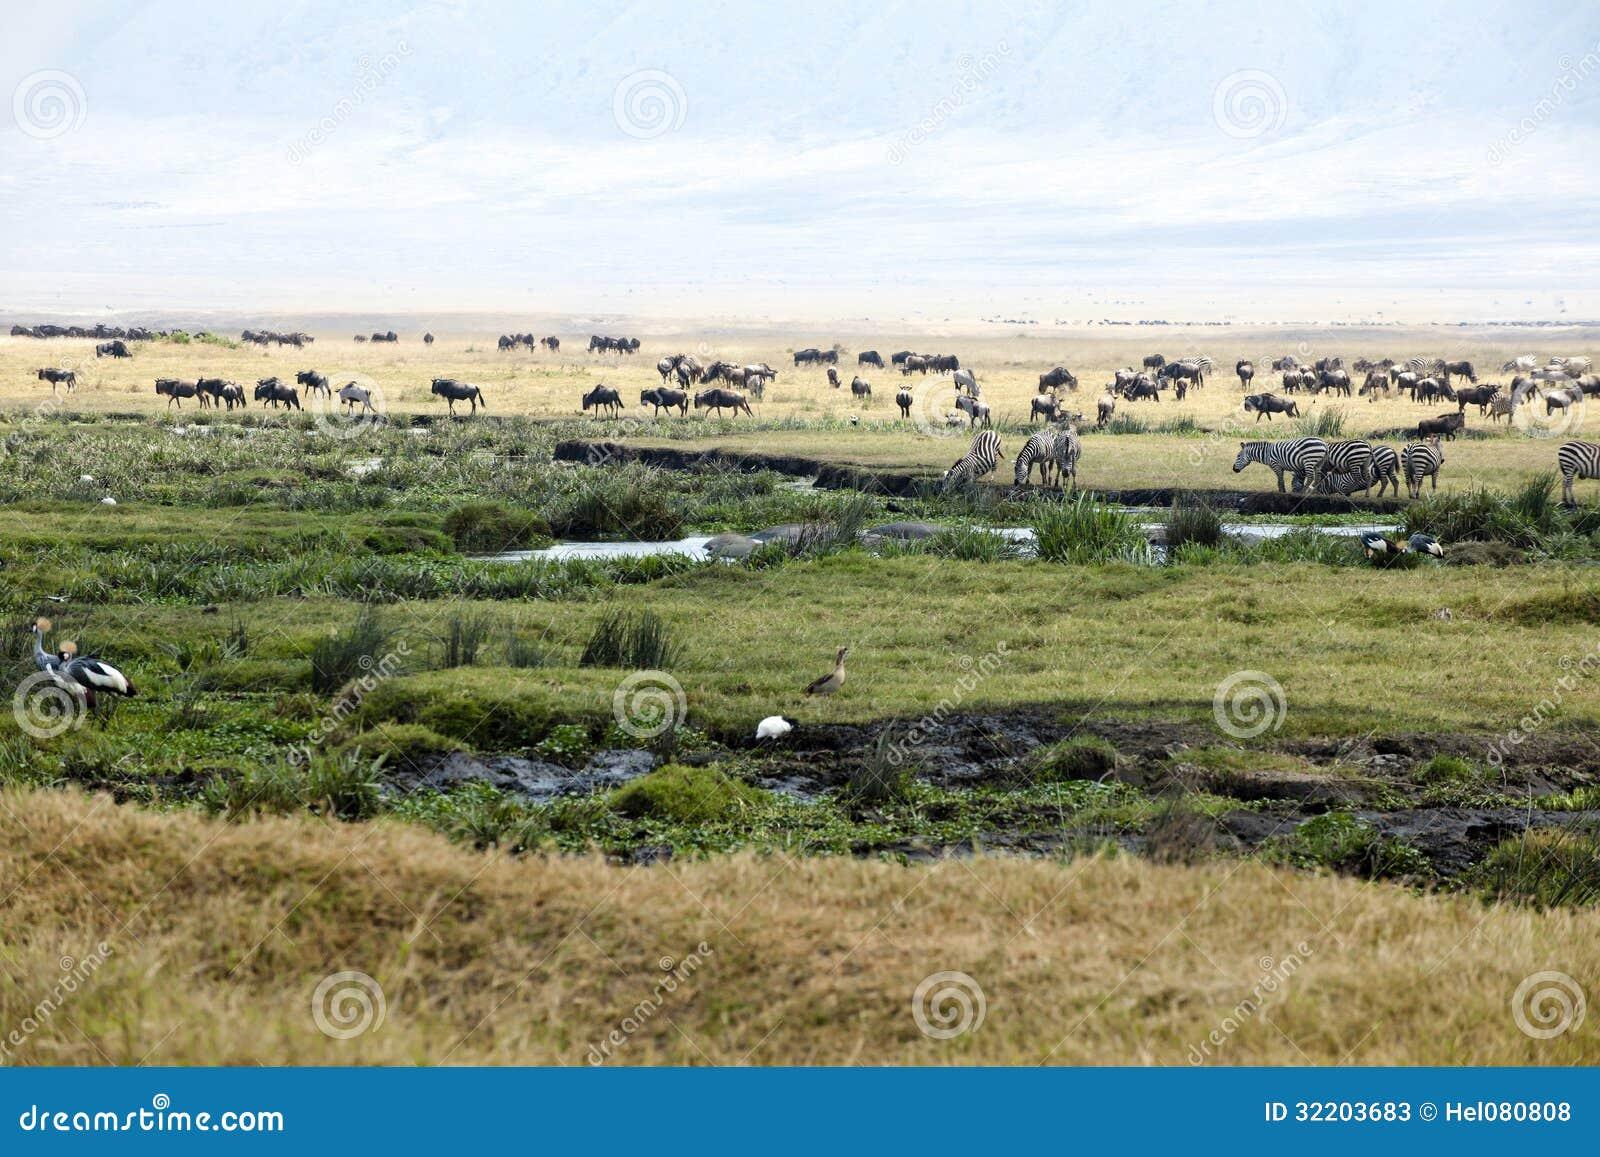 Зебры, гну, гиппопотамы, птицы на кратере Ngorongoro